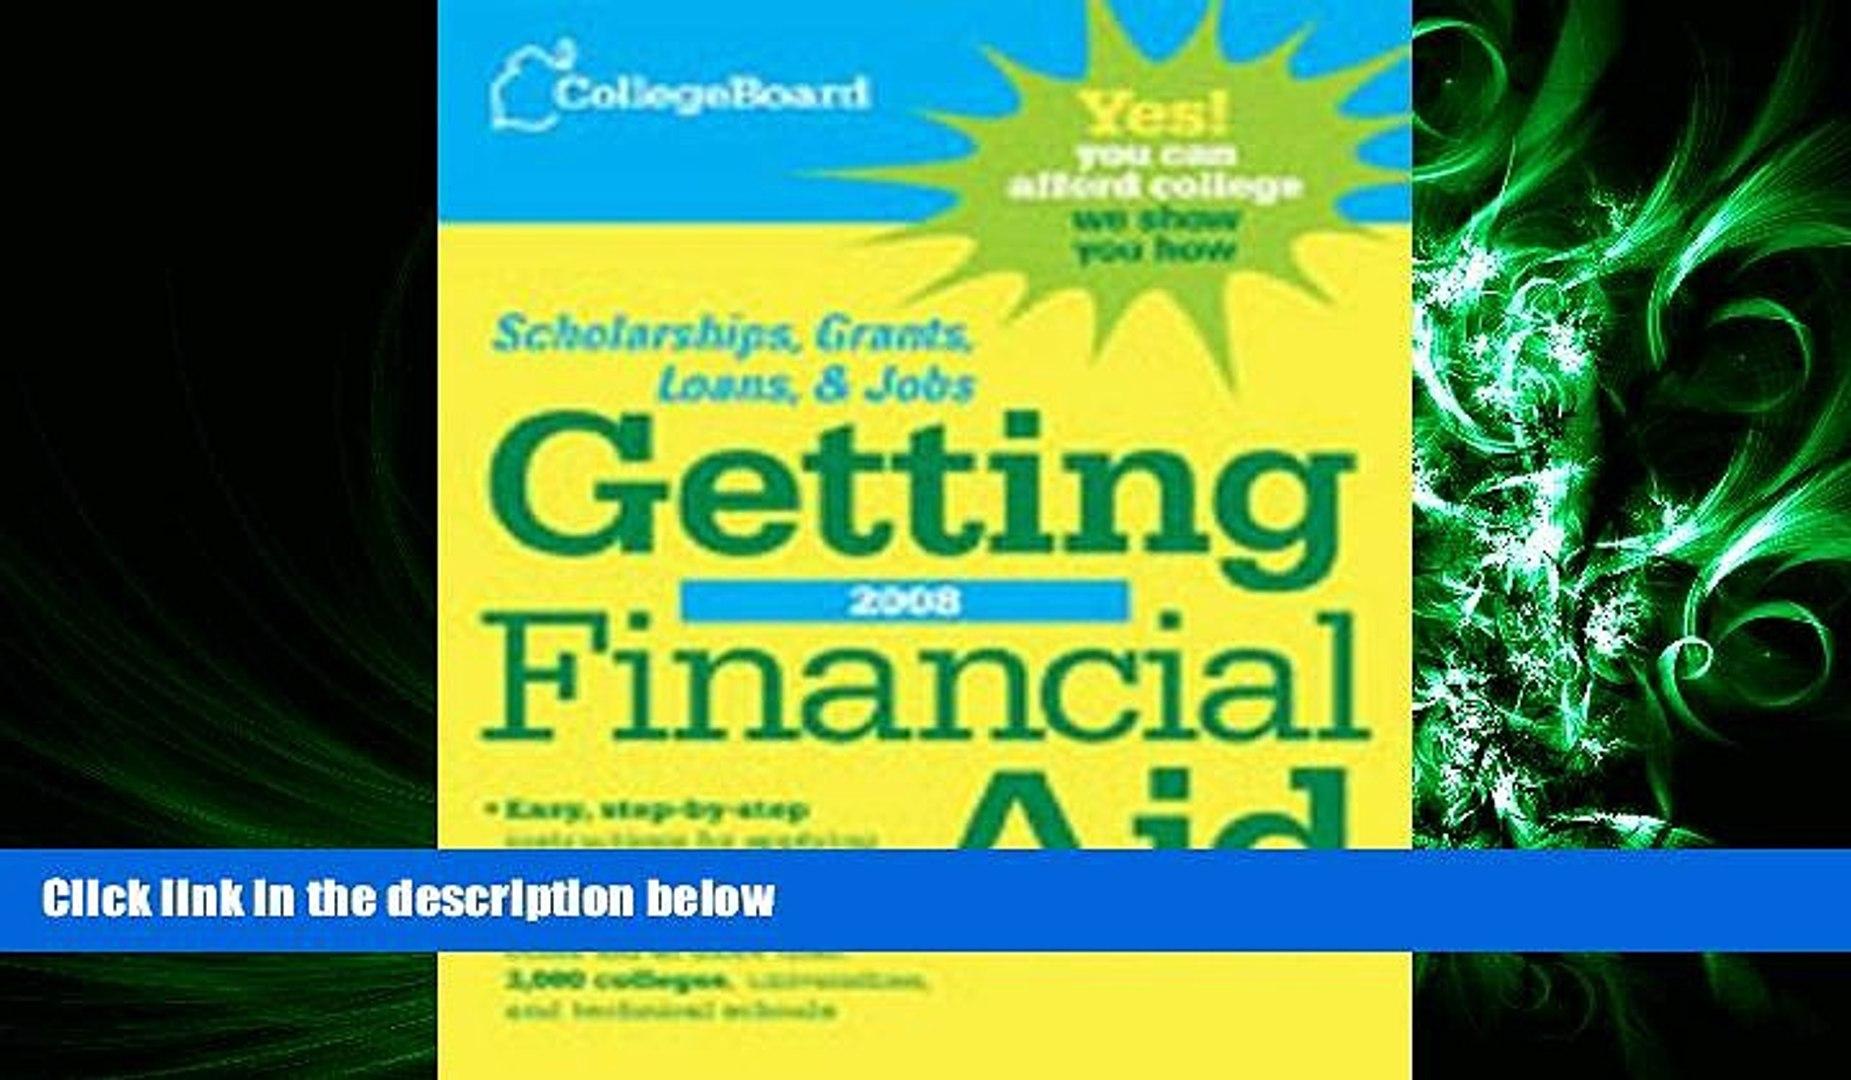 FAVORITE BOOK  The College Board Getting Financial Aid 2008 (College Board Guide to Getting